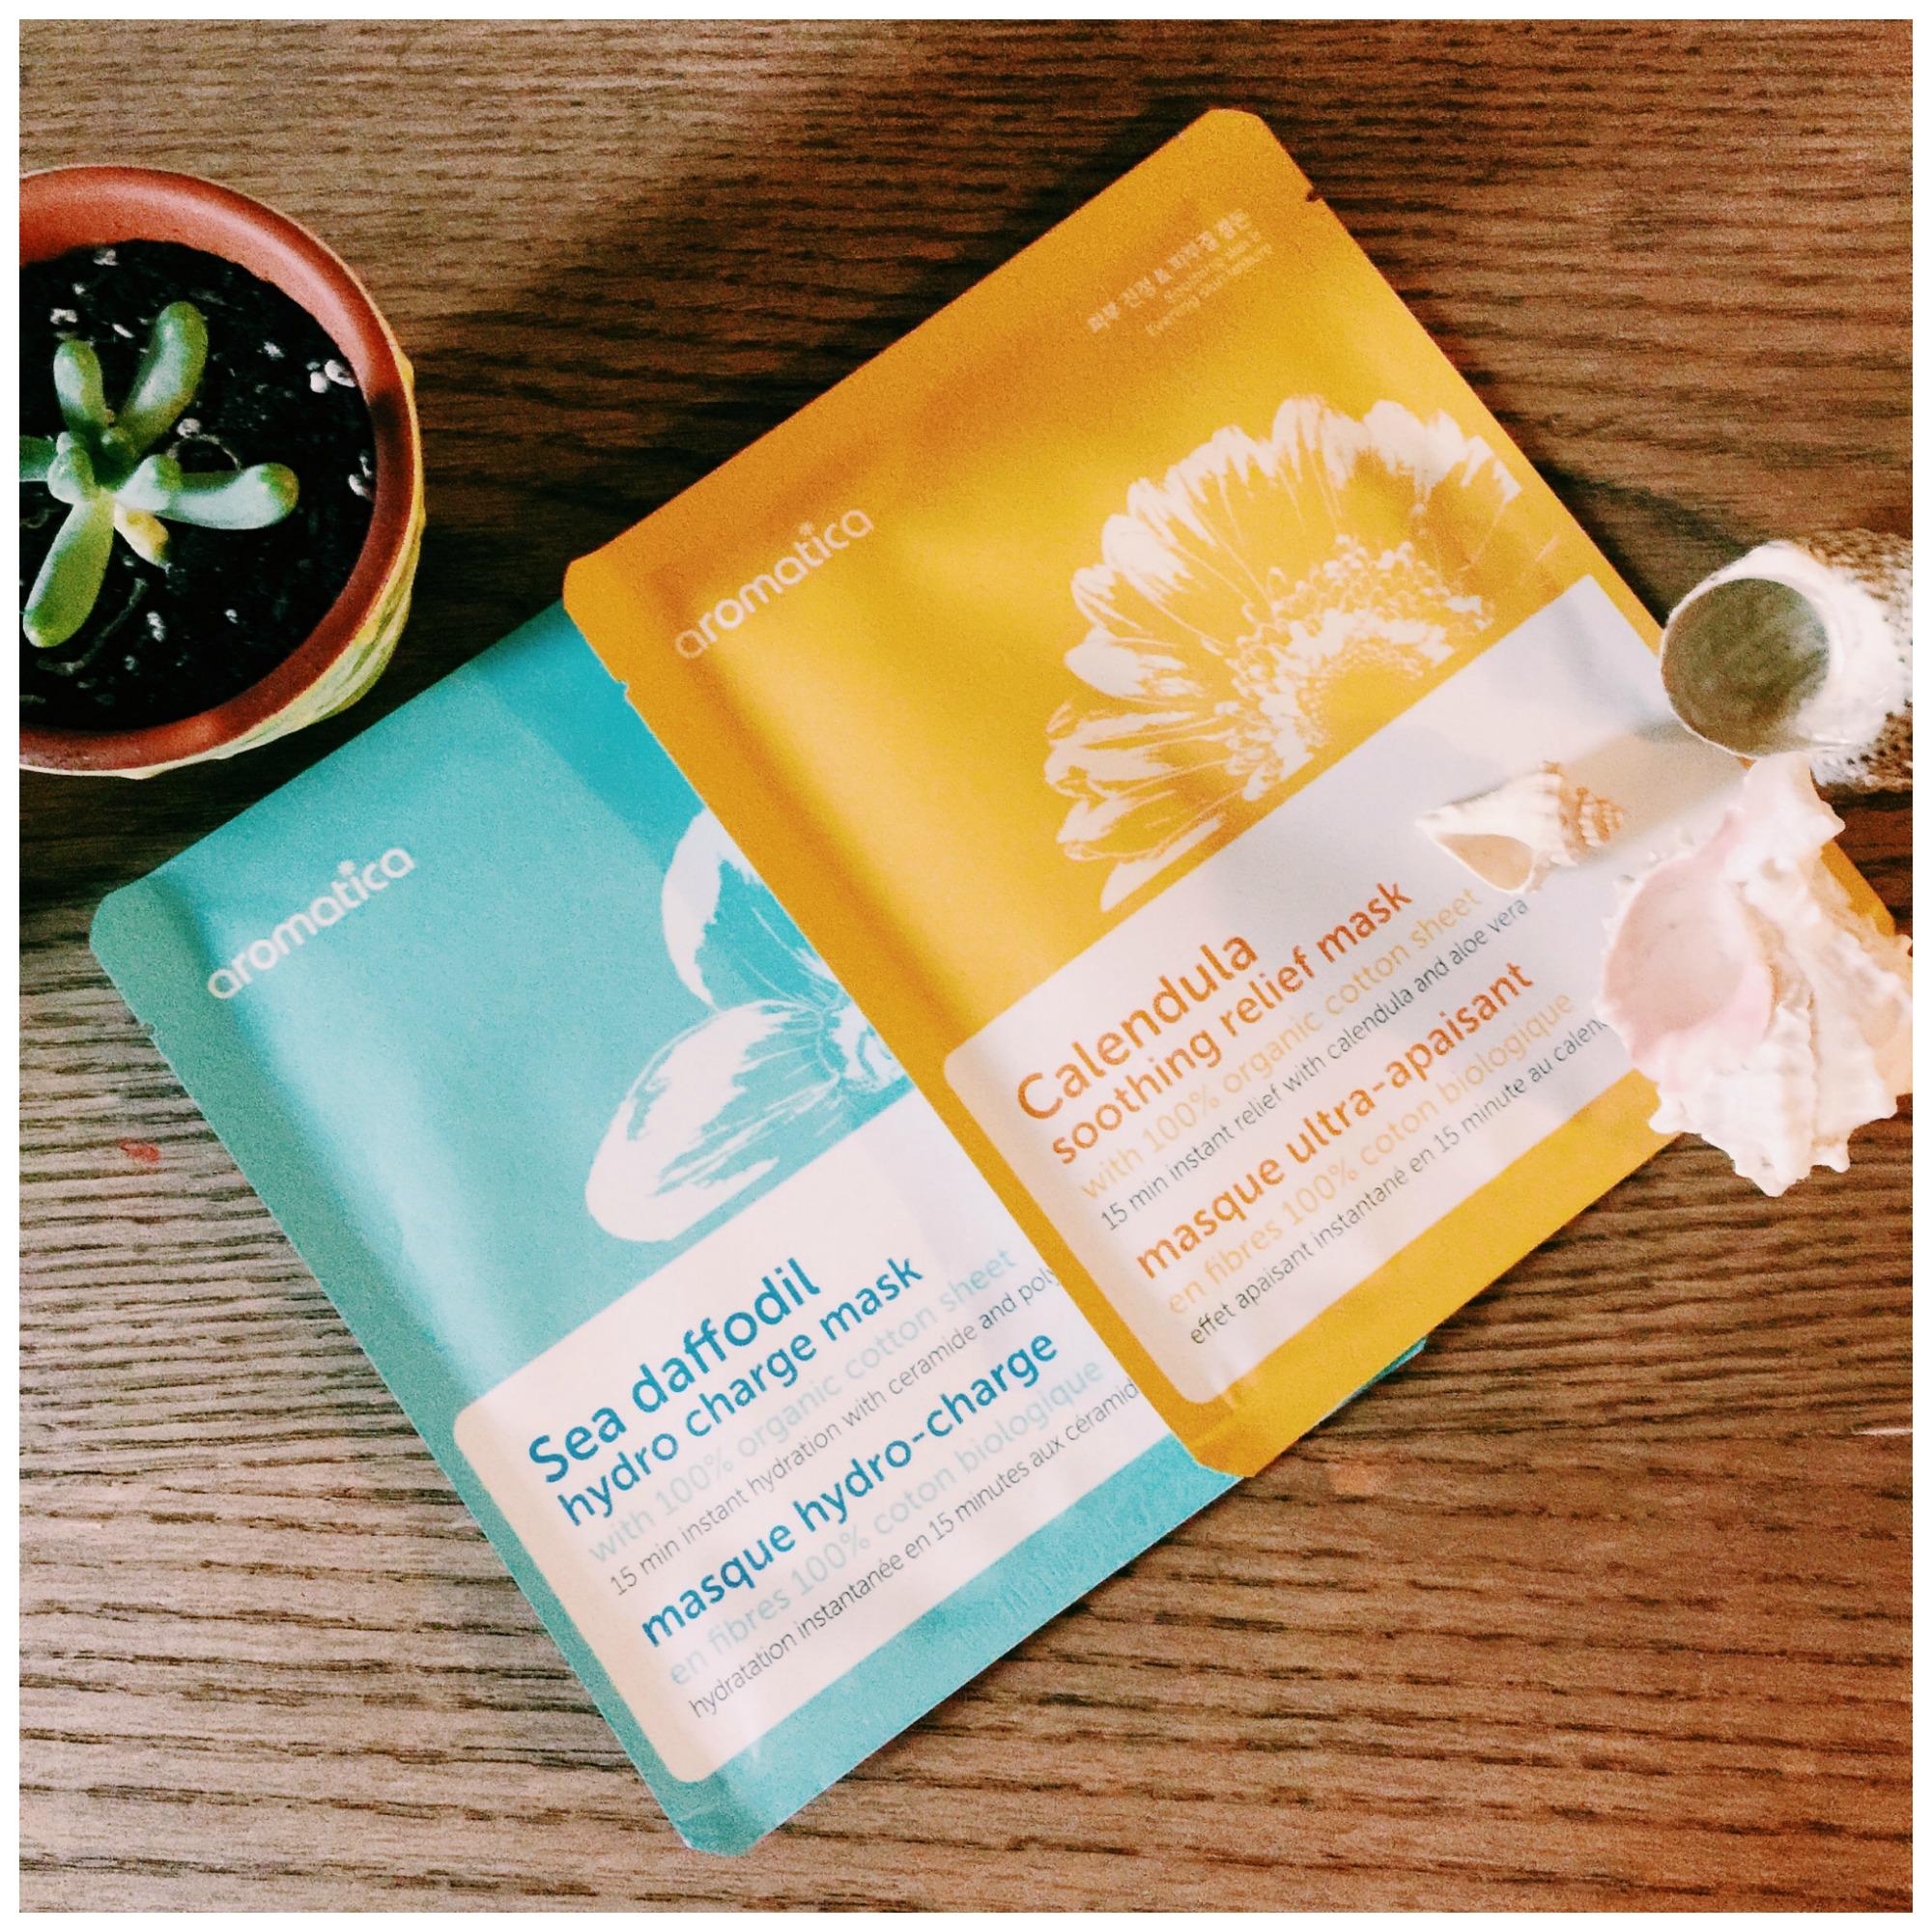 Heel in Brand: Aromatica Skincare